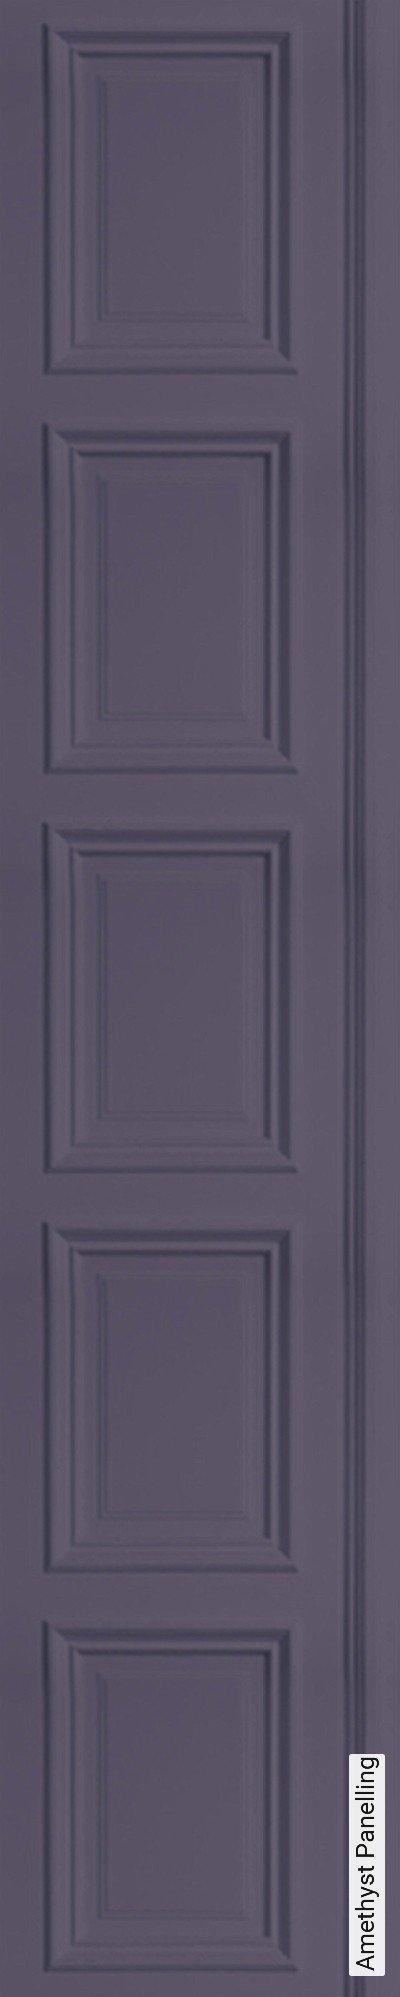 Amethyst-Panelling-Vertäfelung-3D-Tapeten-tromp-l